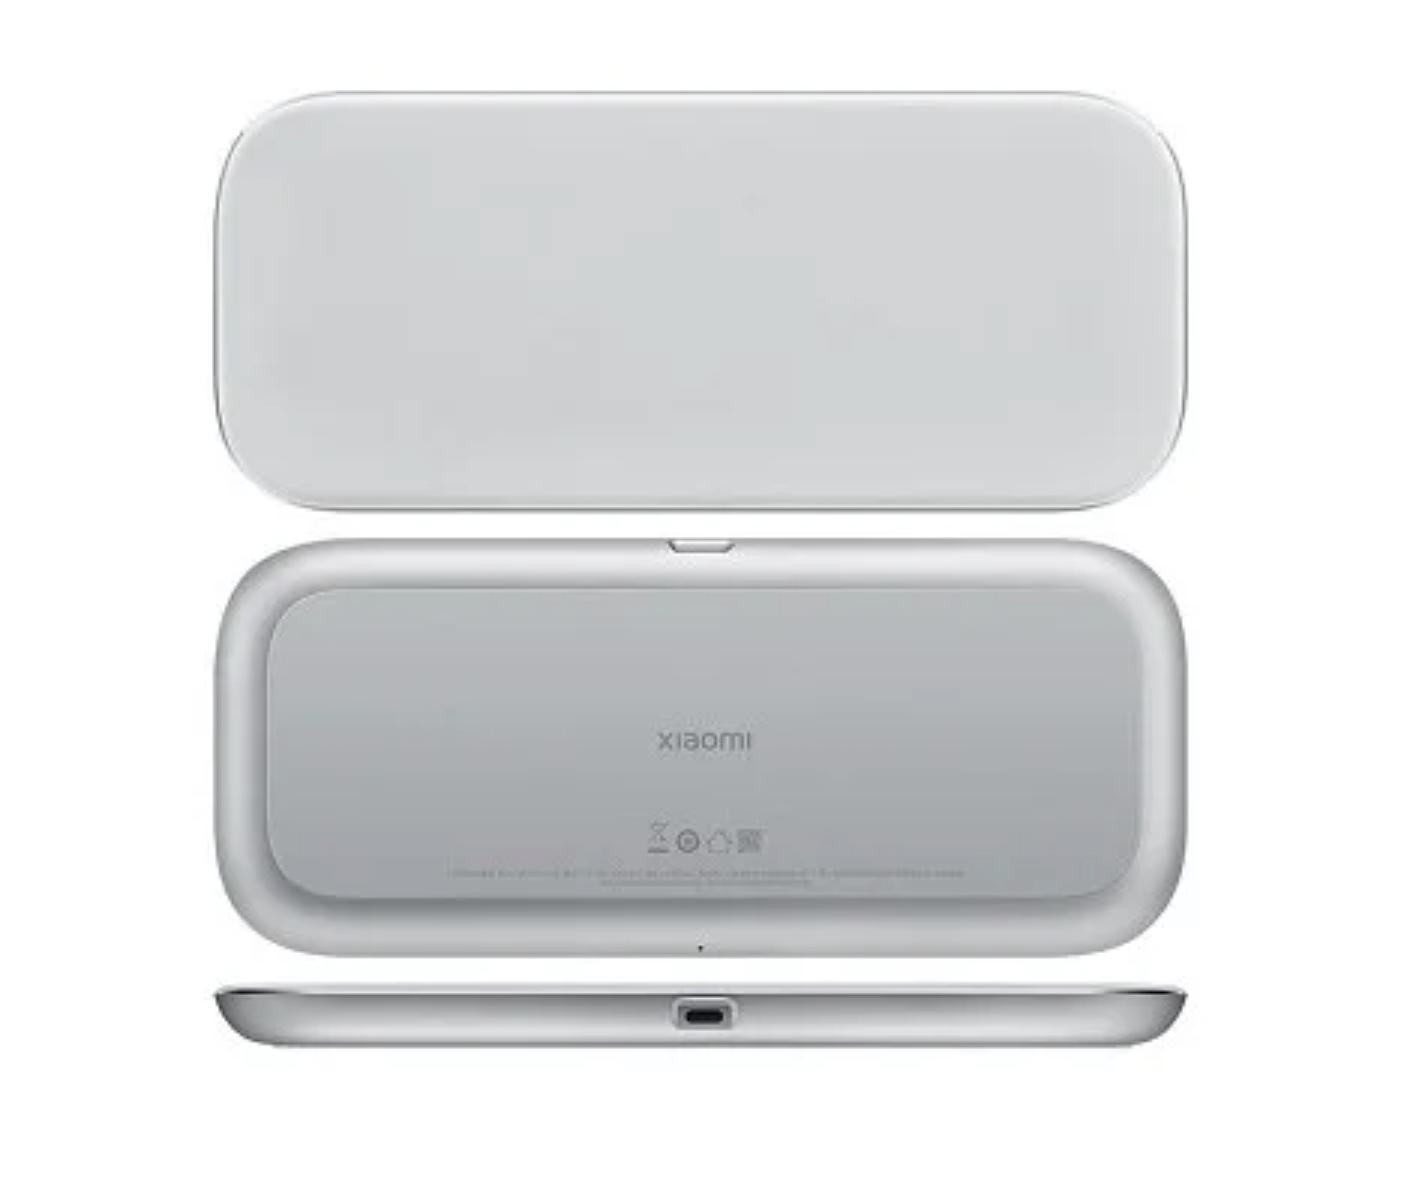 Xiaomi 120W Wireless Charger Multi Geräte Test